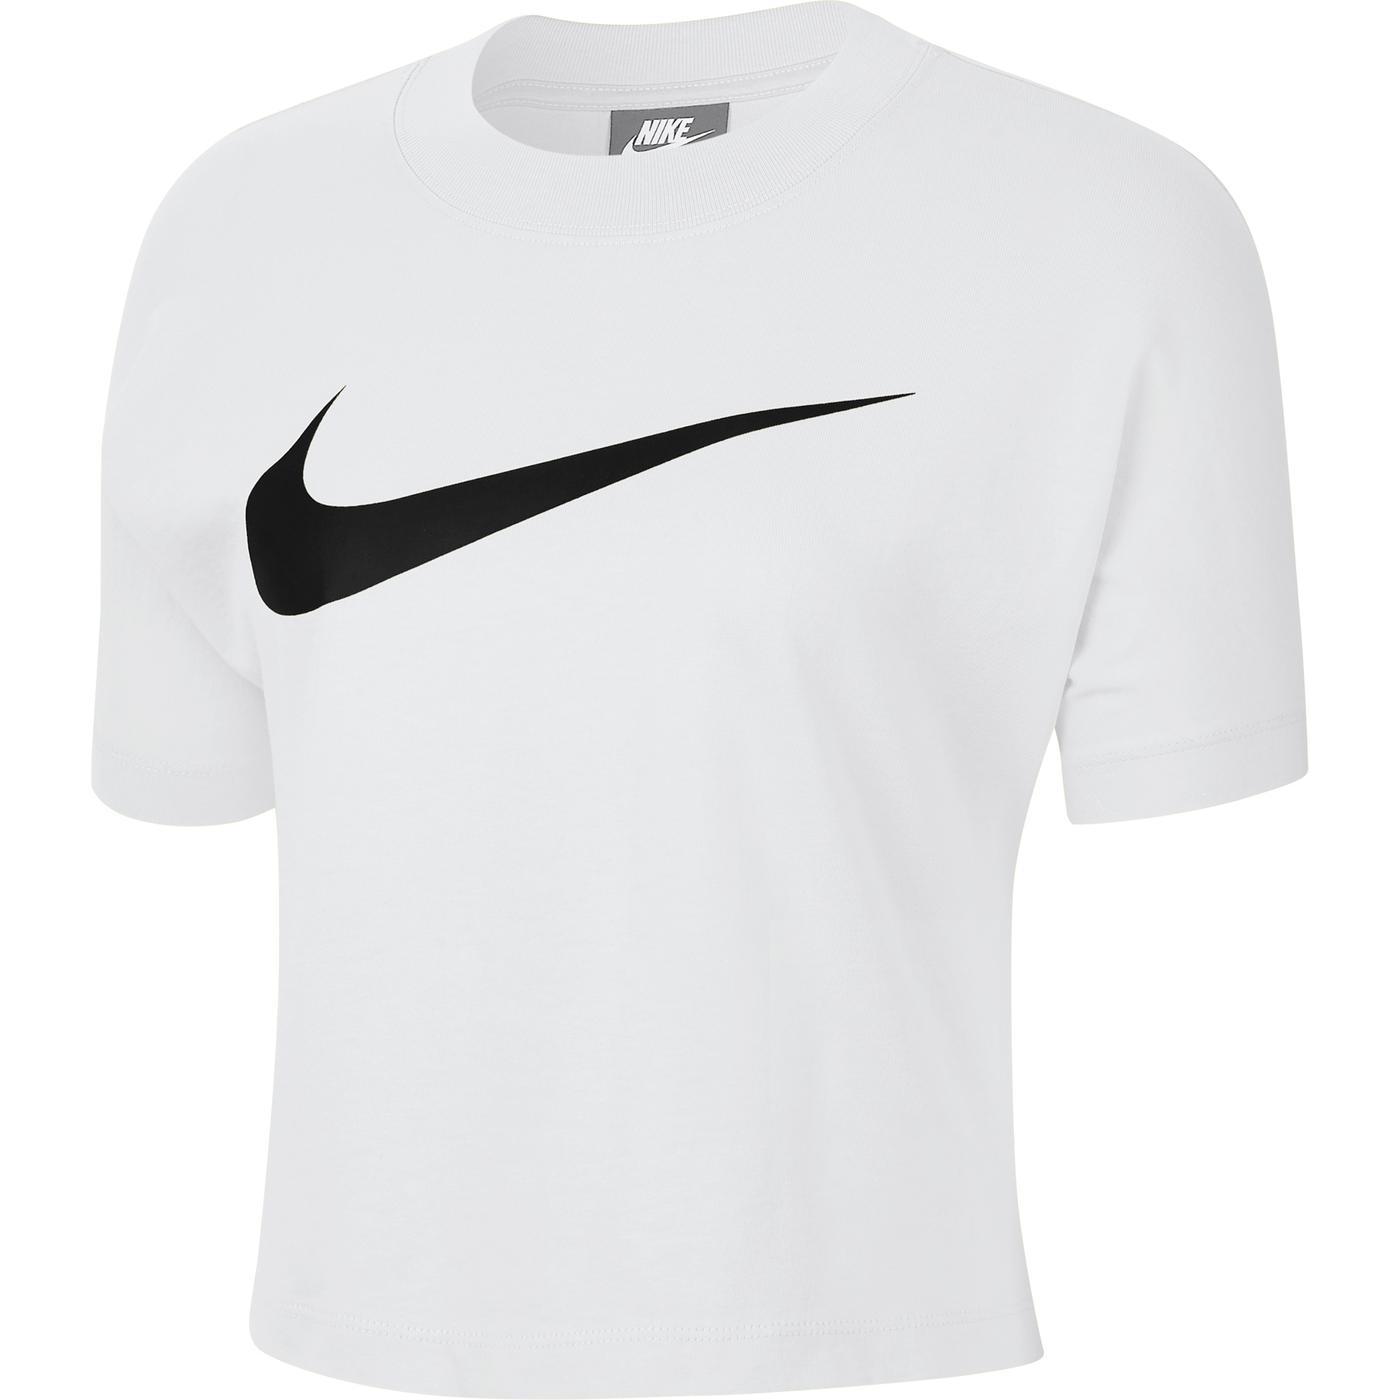 Nike Sportswear Swoosh Kadın Beyaz T-Shirt